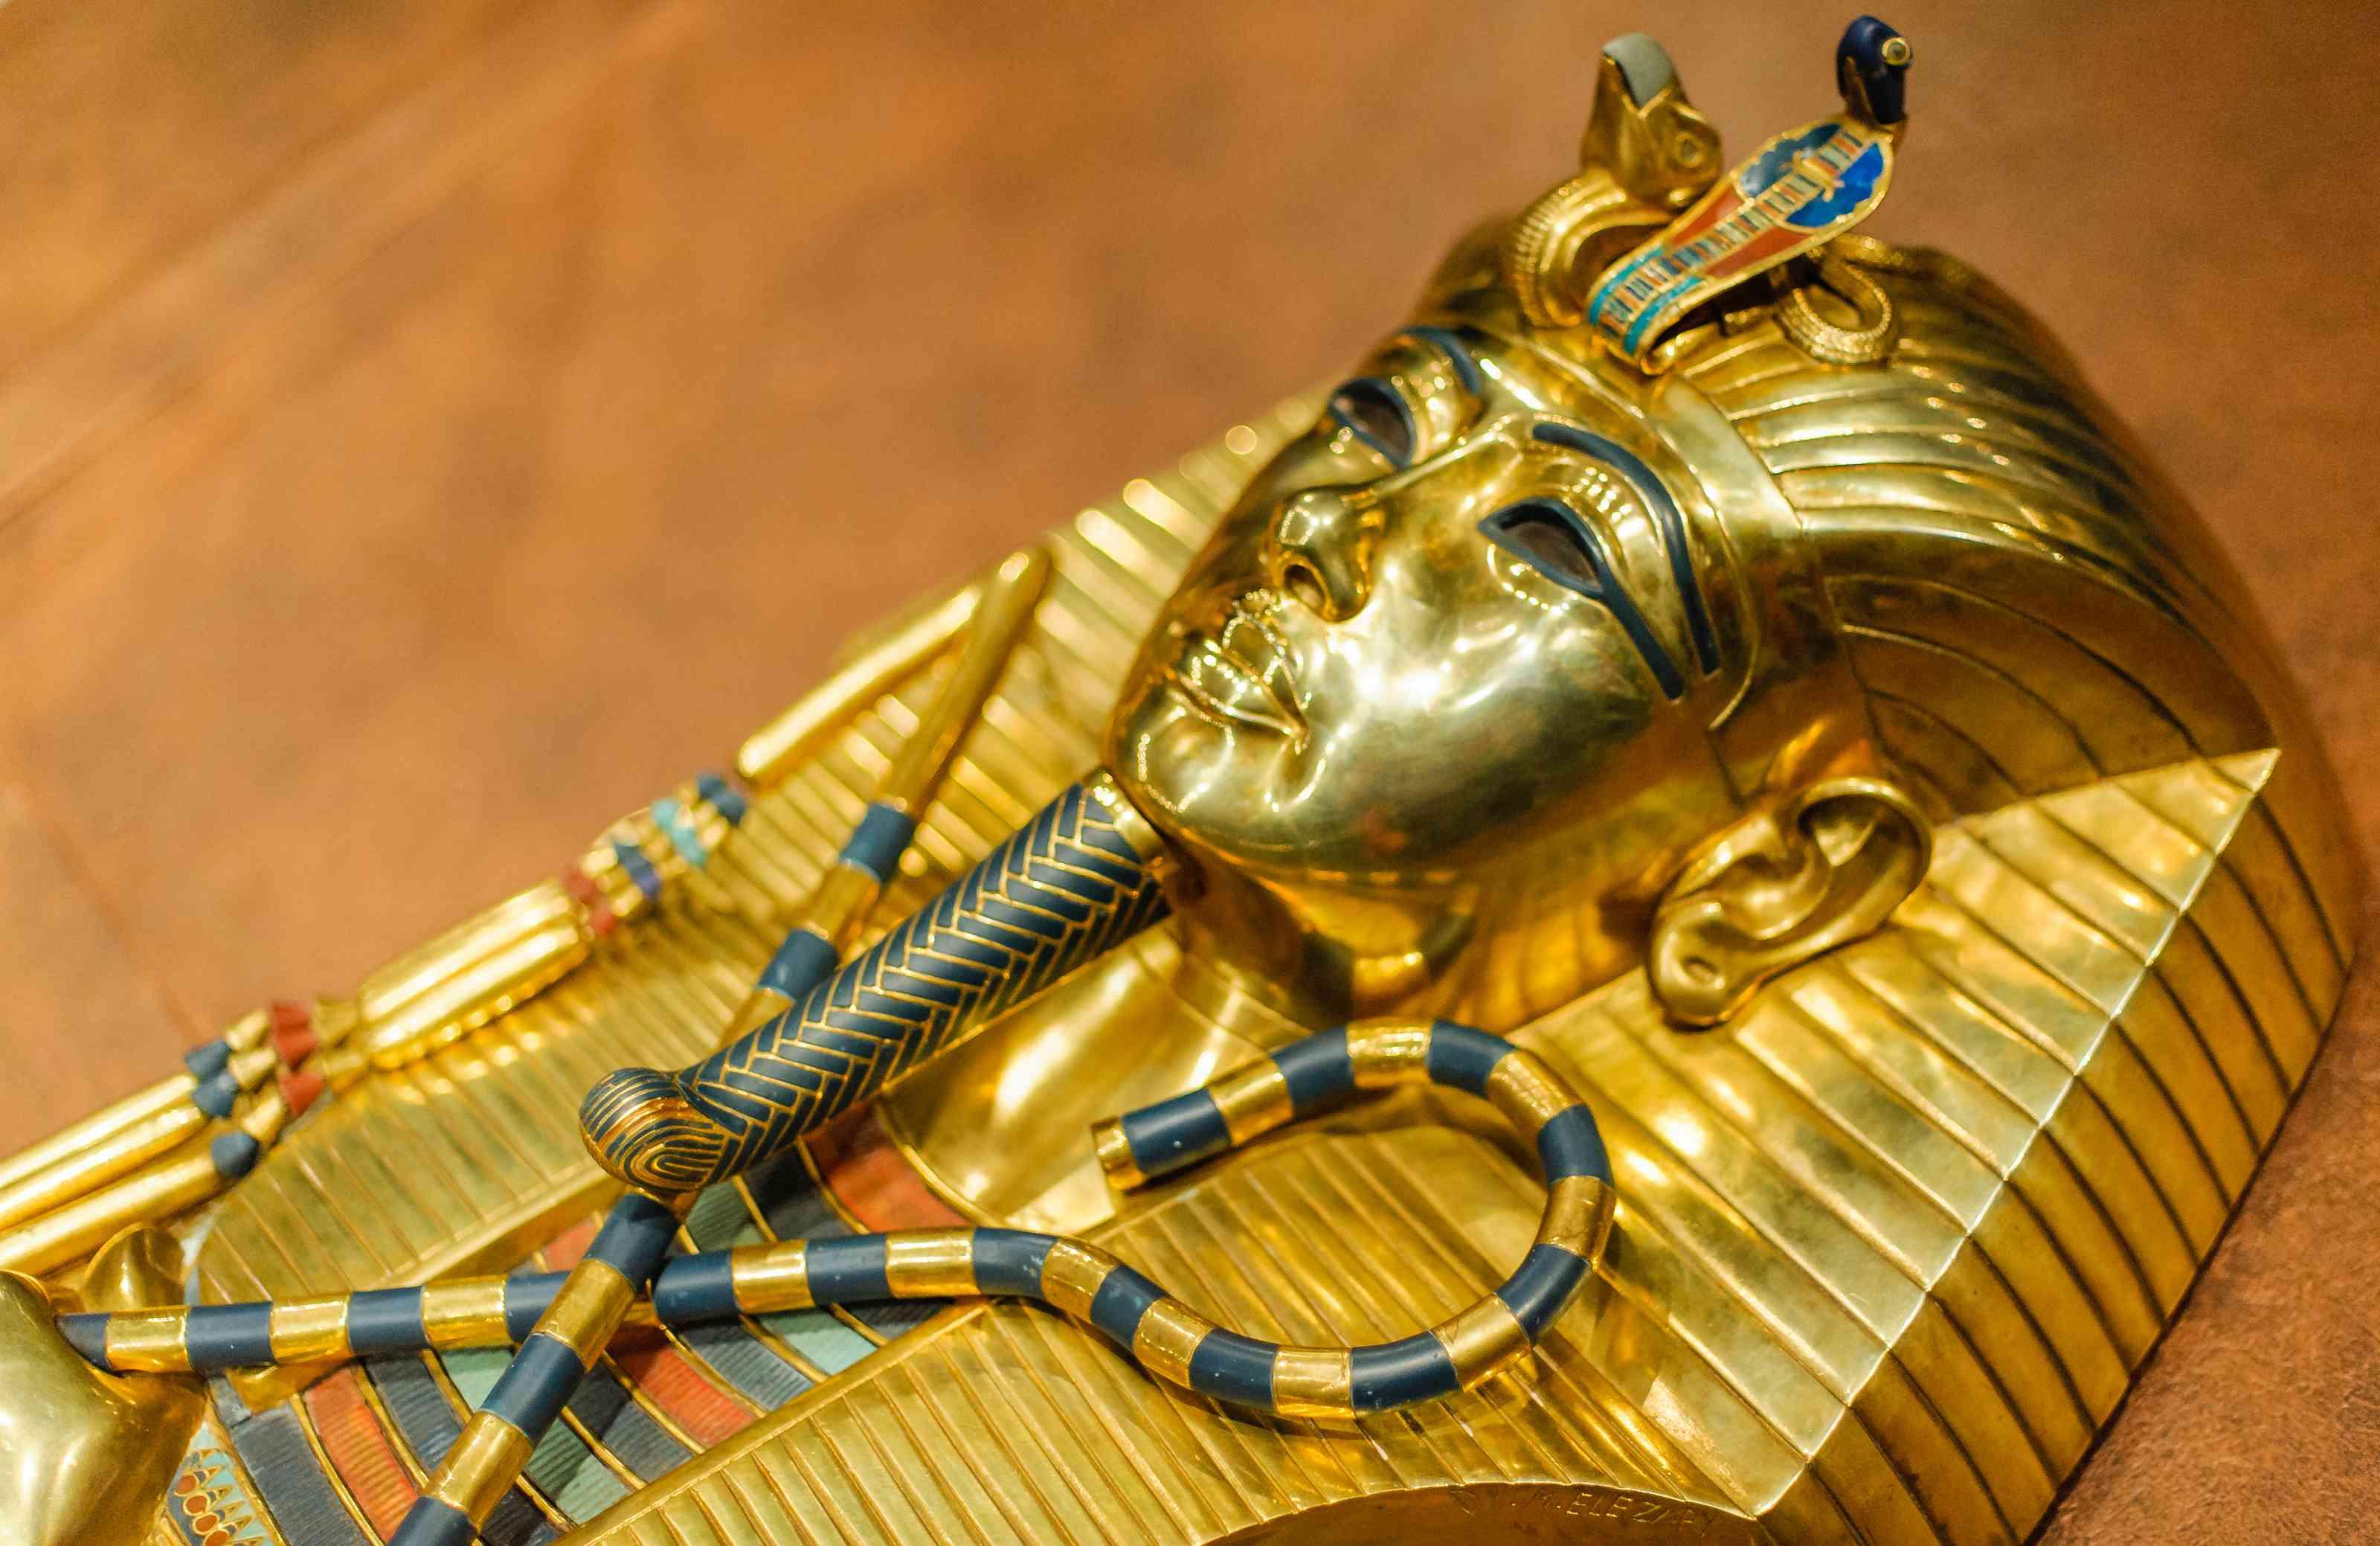 Replica of the golden Mask of Tutankhamun